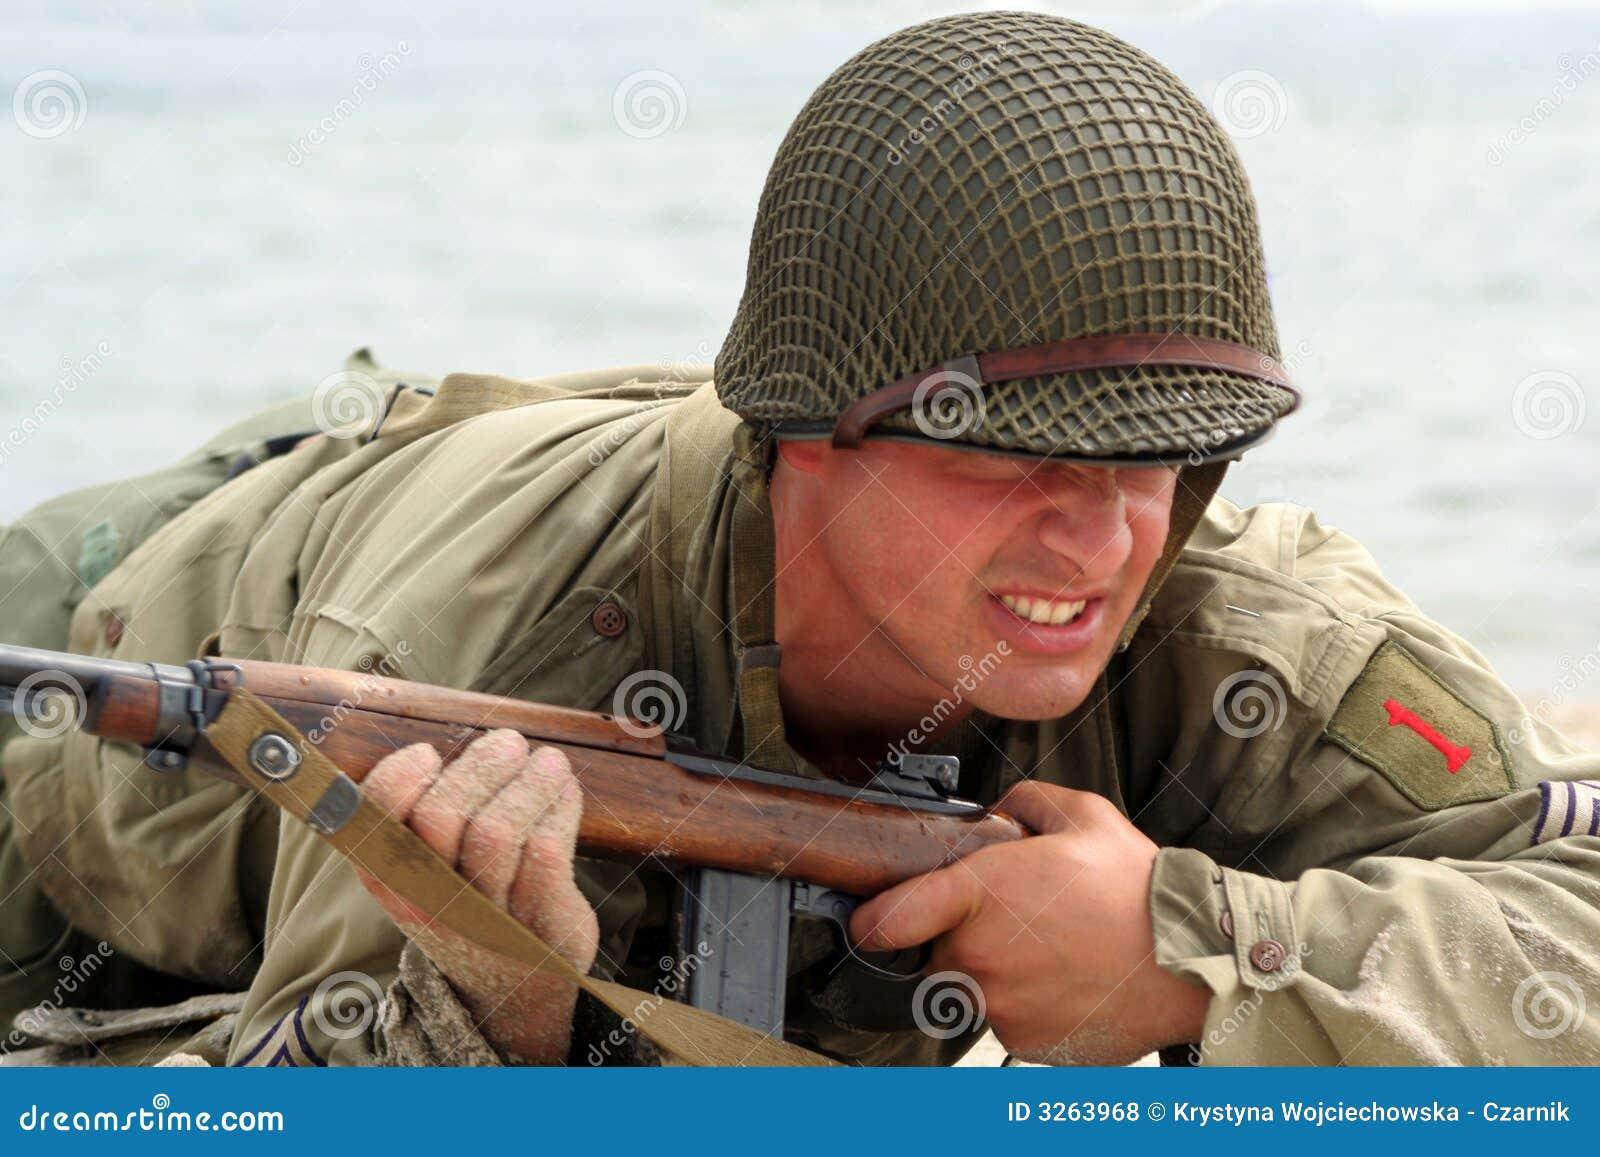 Soldat américain de rampement